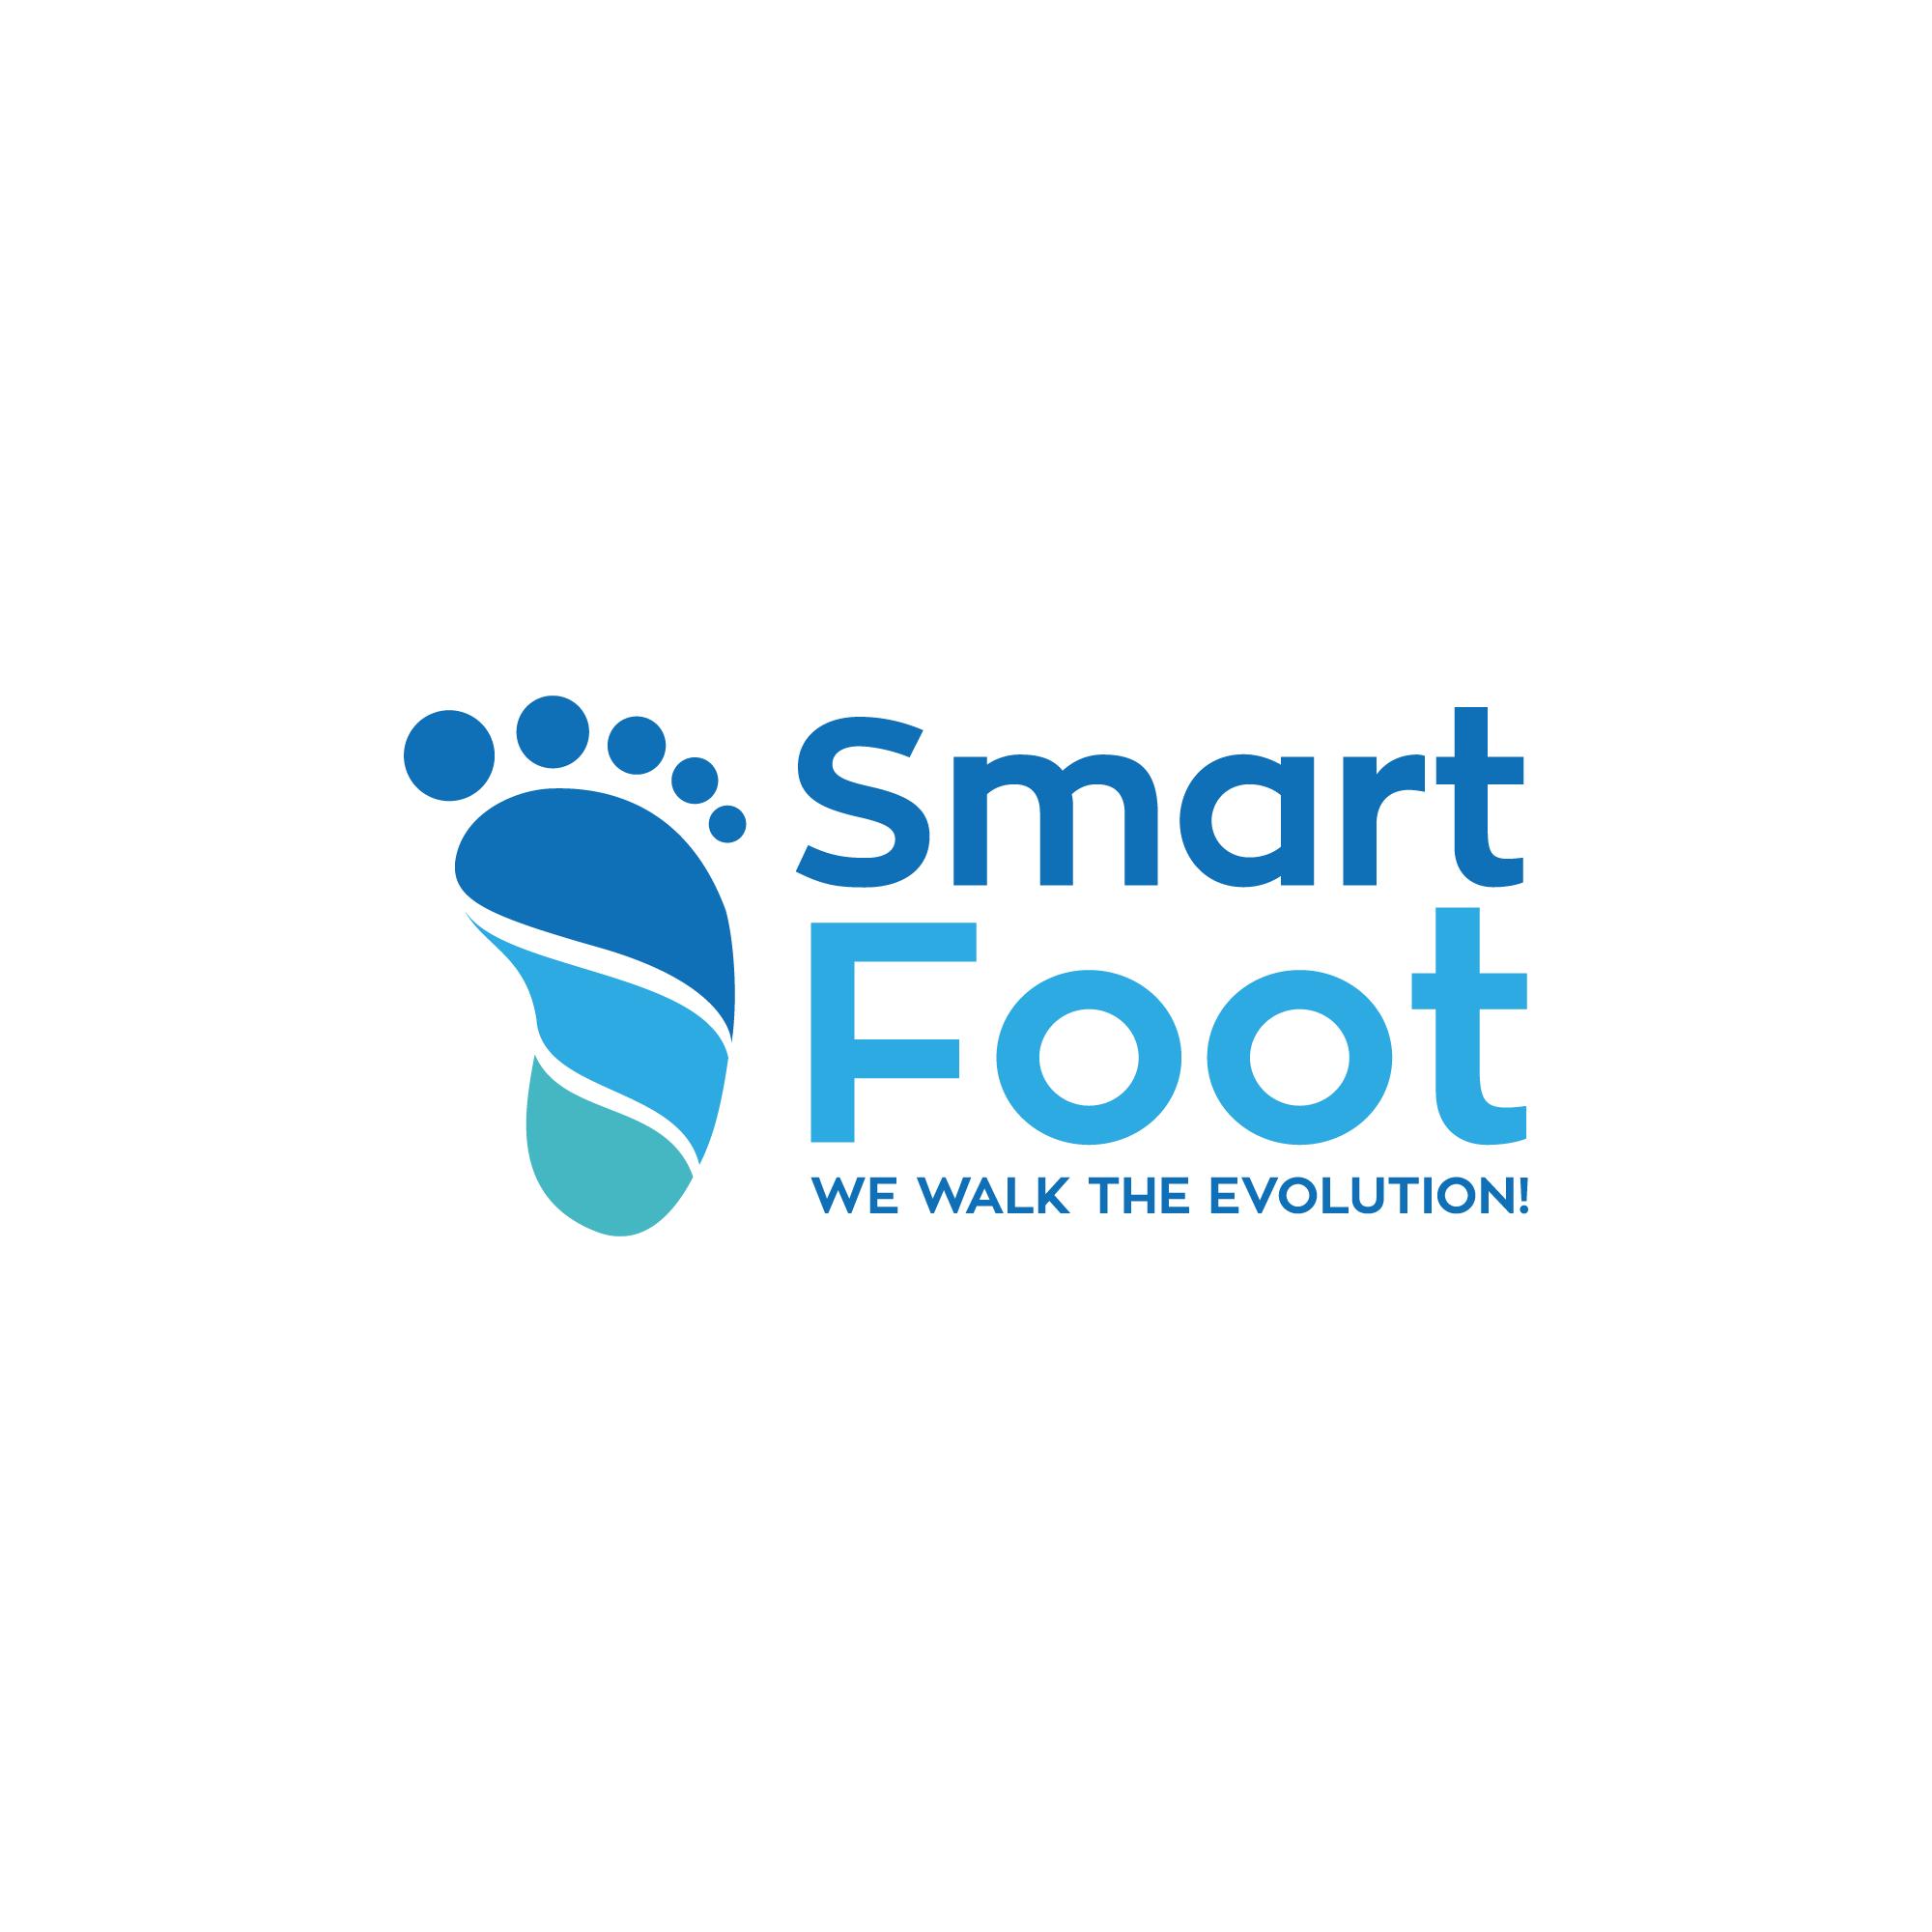 NEW Platinum Logo Design Contest: SmartFoot – We walk the evolution!